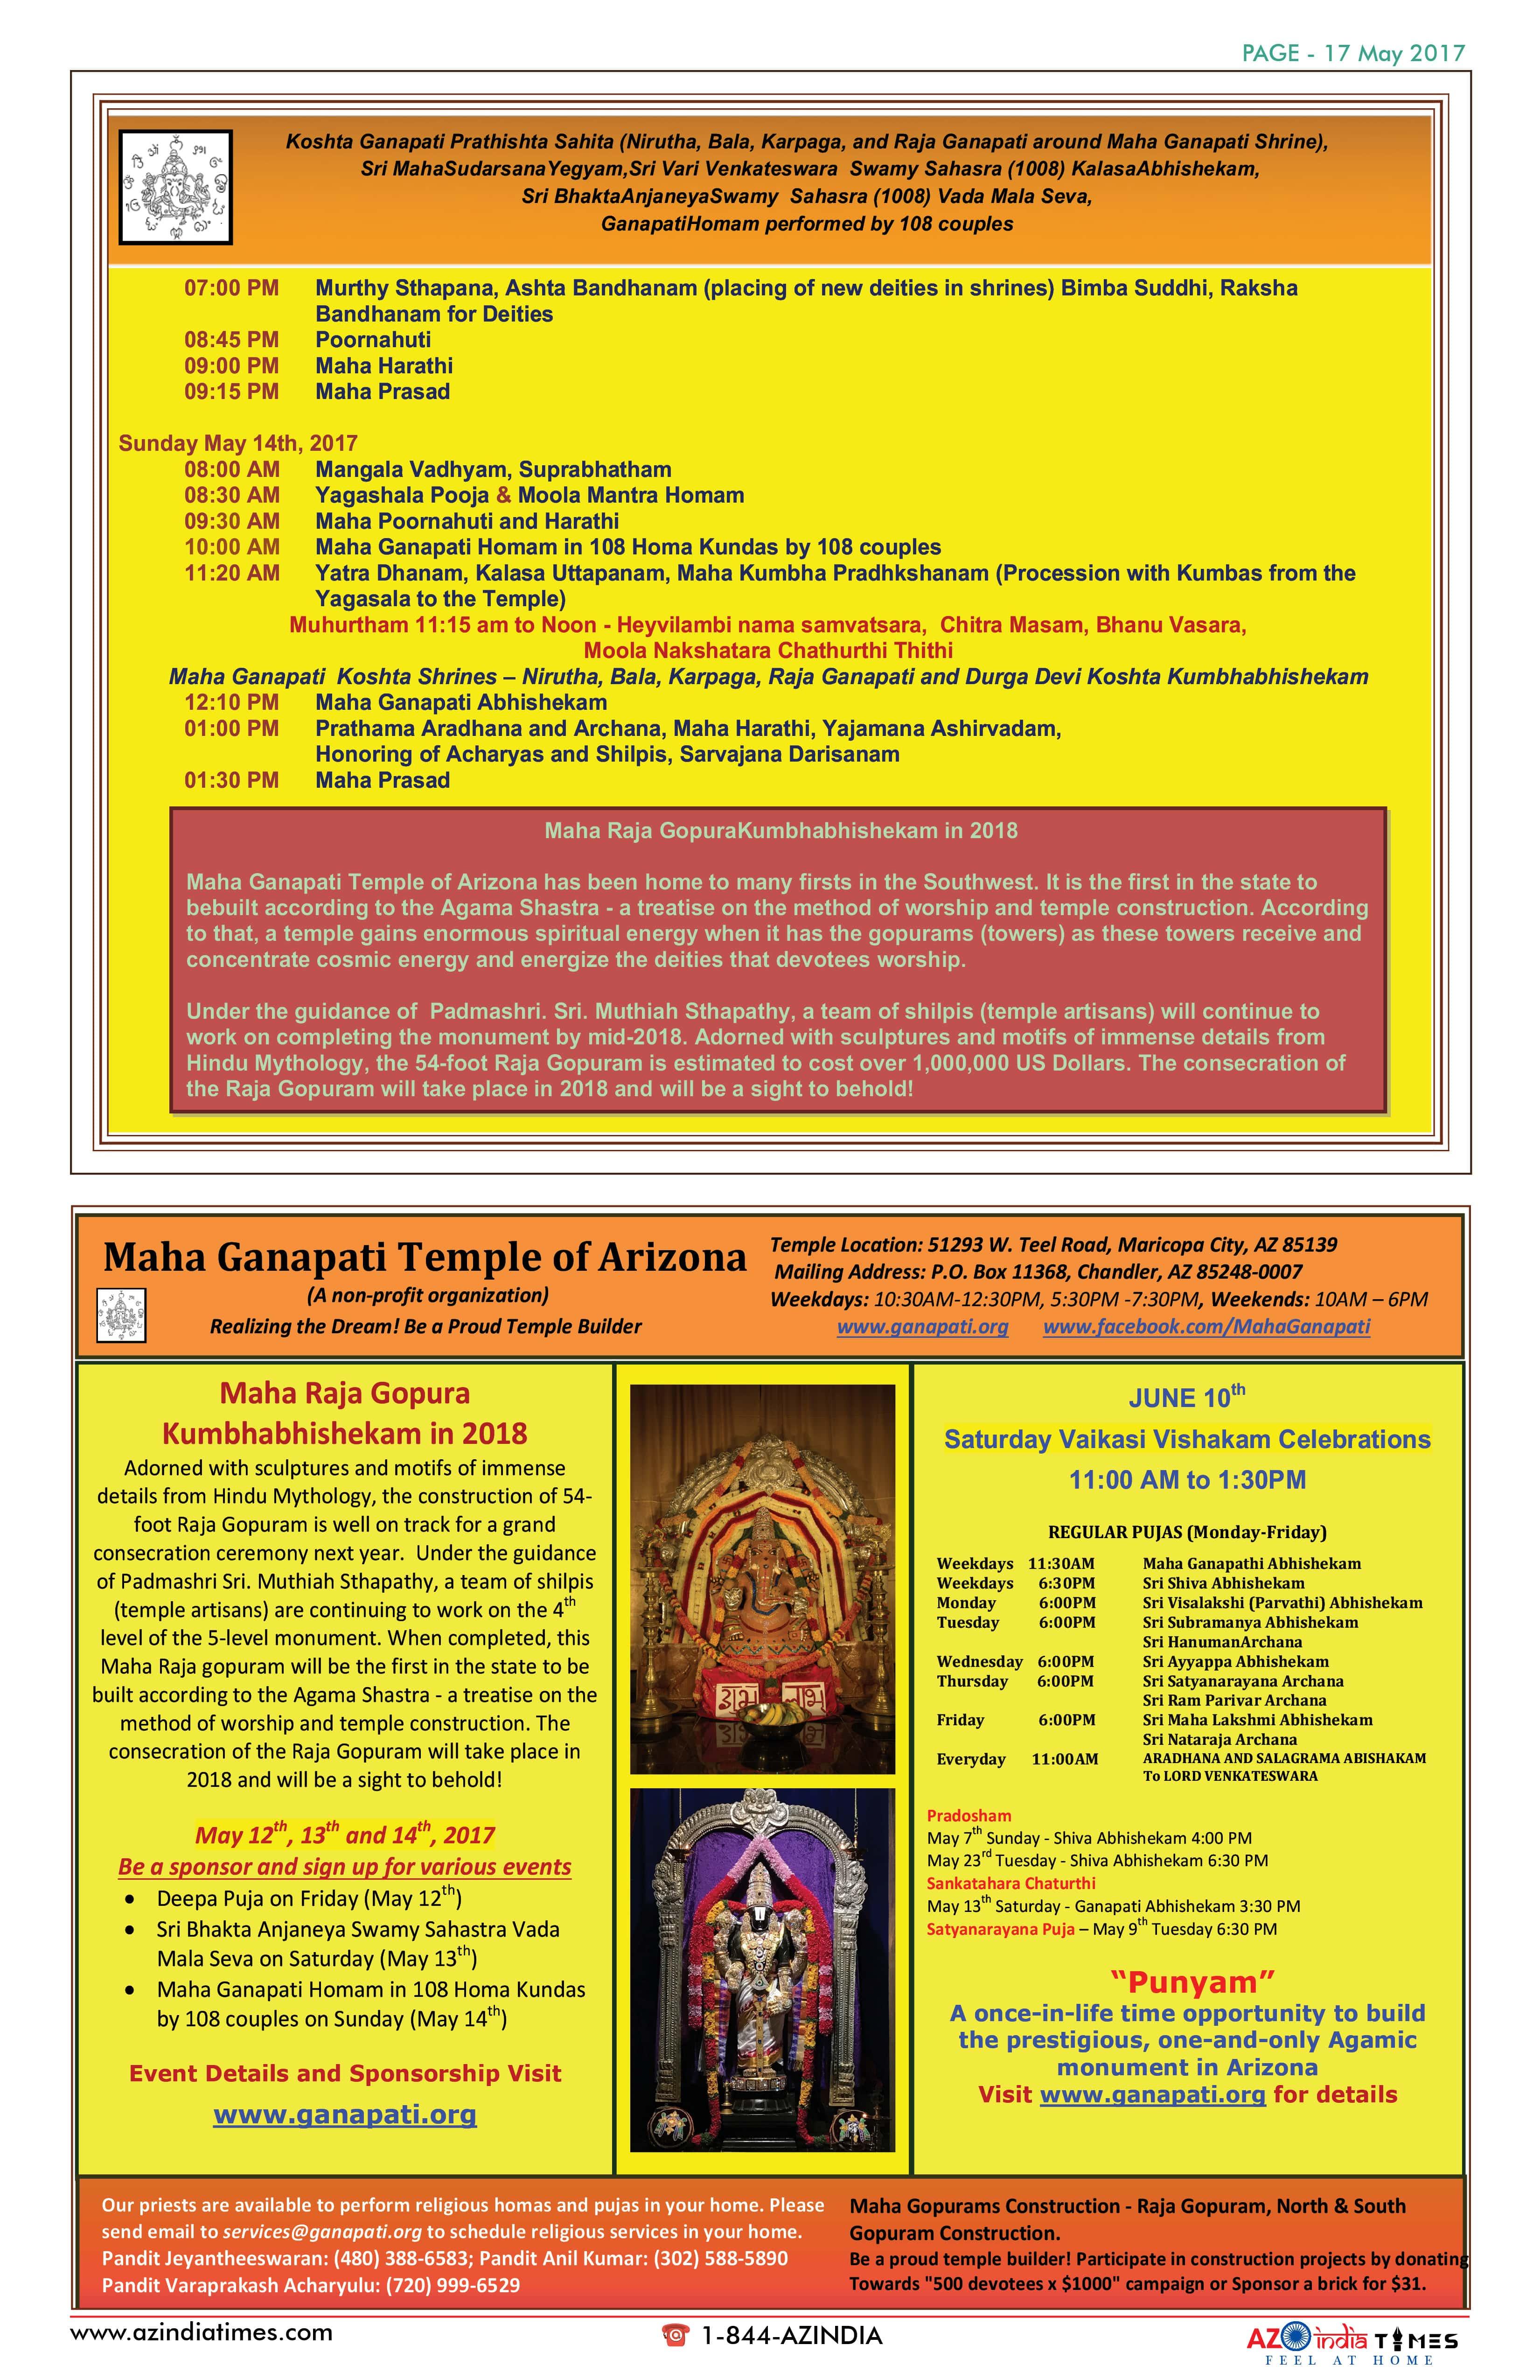 AZ INDIA MAY EDITION17